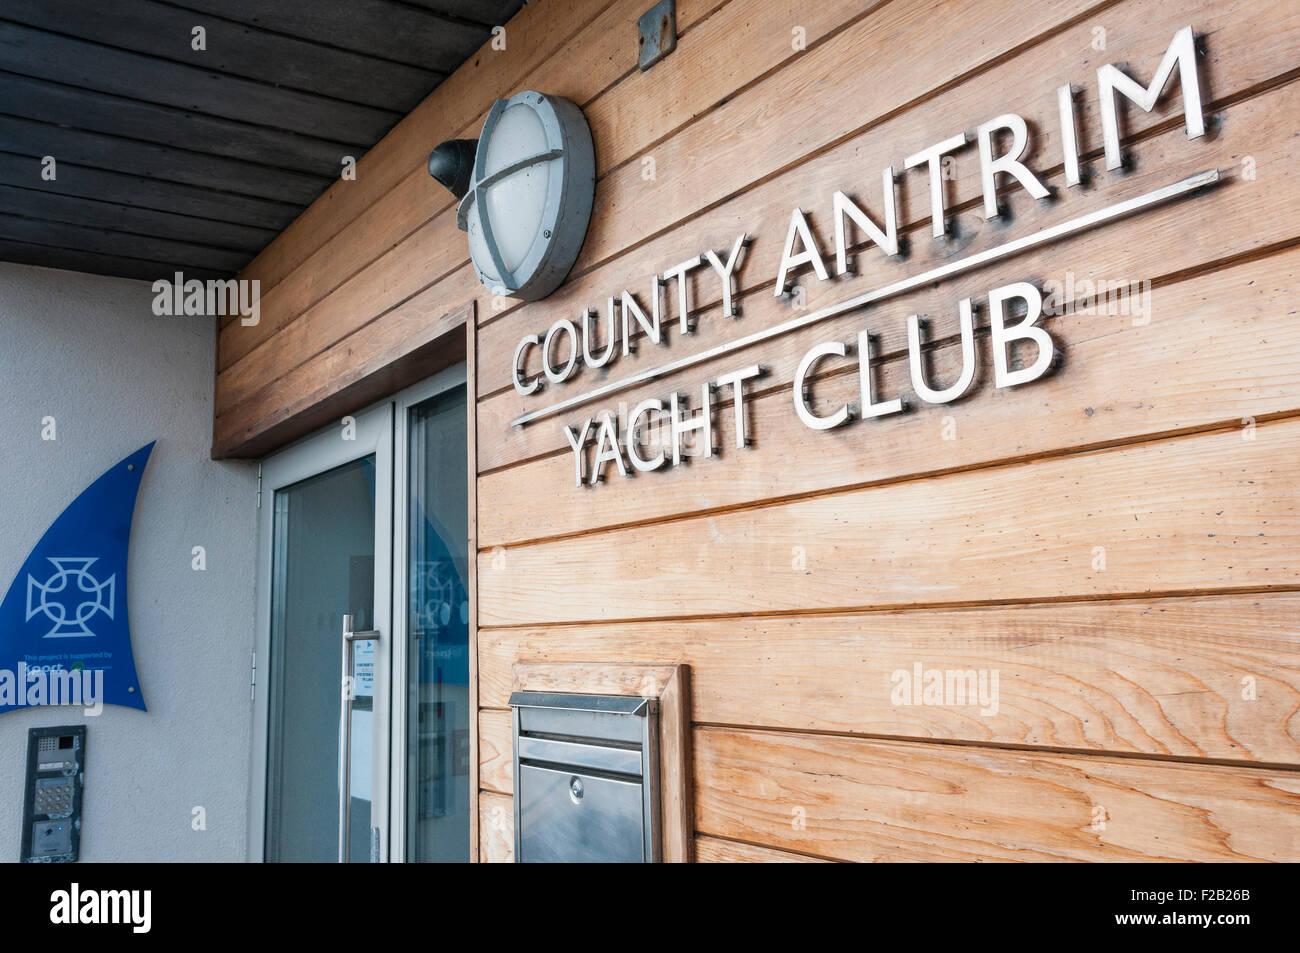 County Antrim Yacht Club, Whitehead - Stock Image